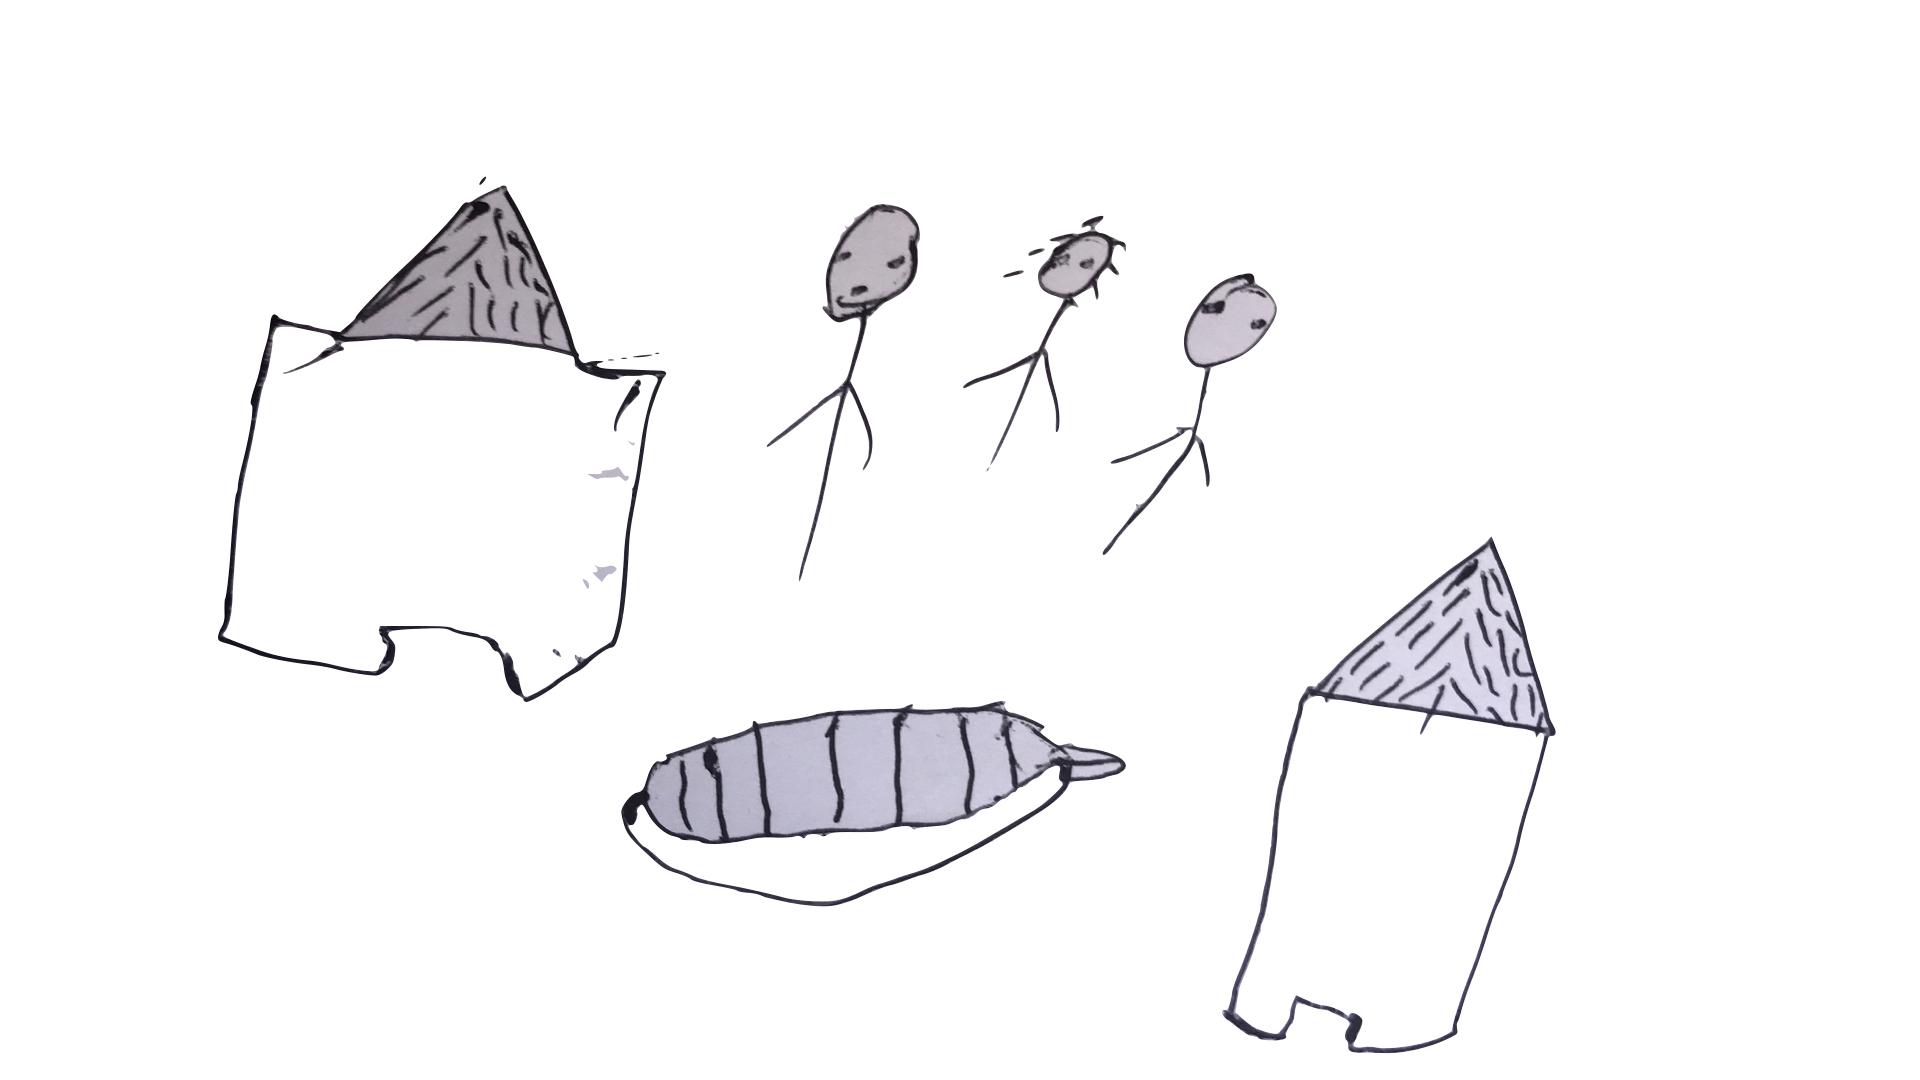 drawings.004.jpeg